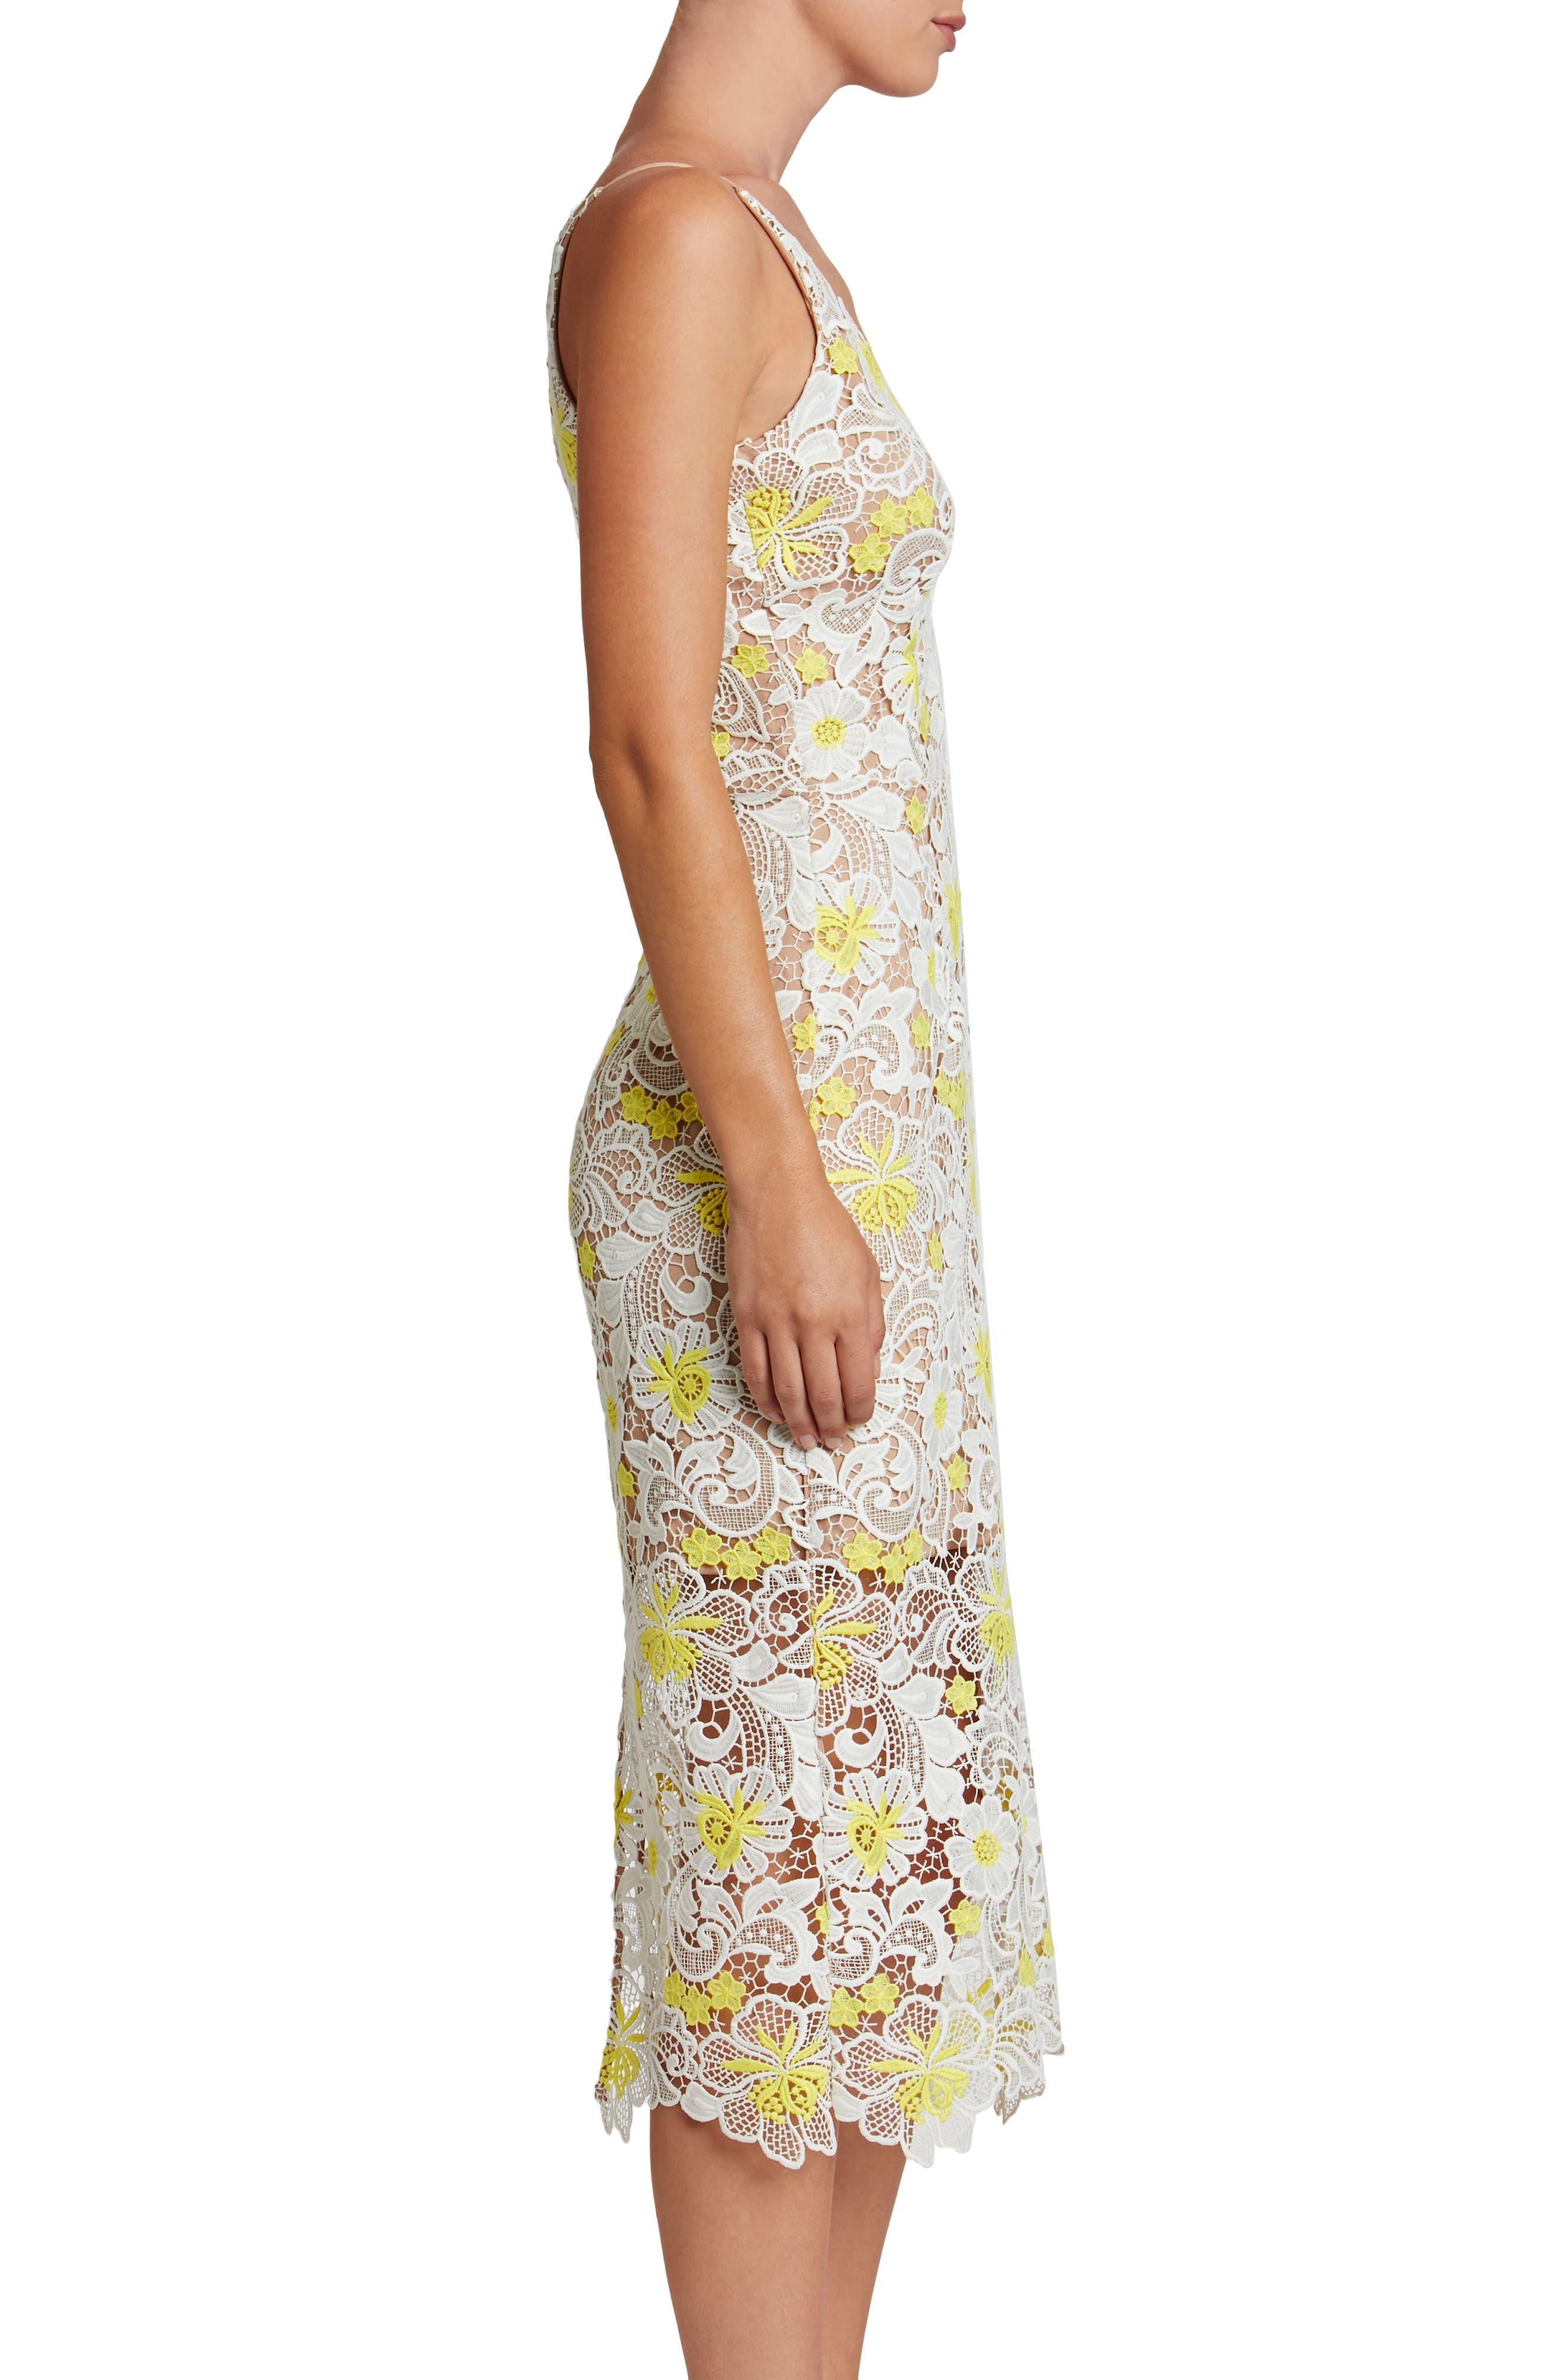 Aurora Floral Midi Dress,                             Alternate thumbnail 3, color,                             White/ Yellow Floral